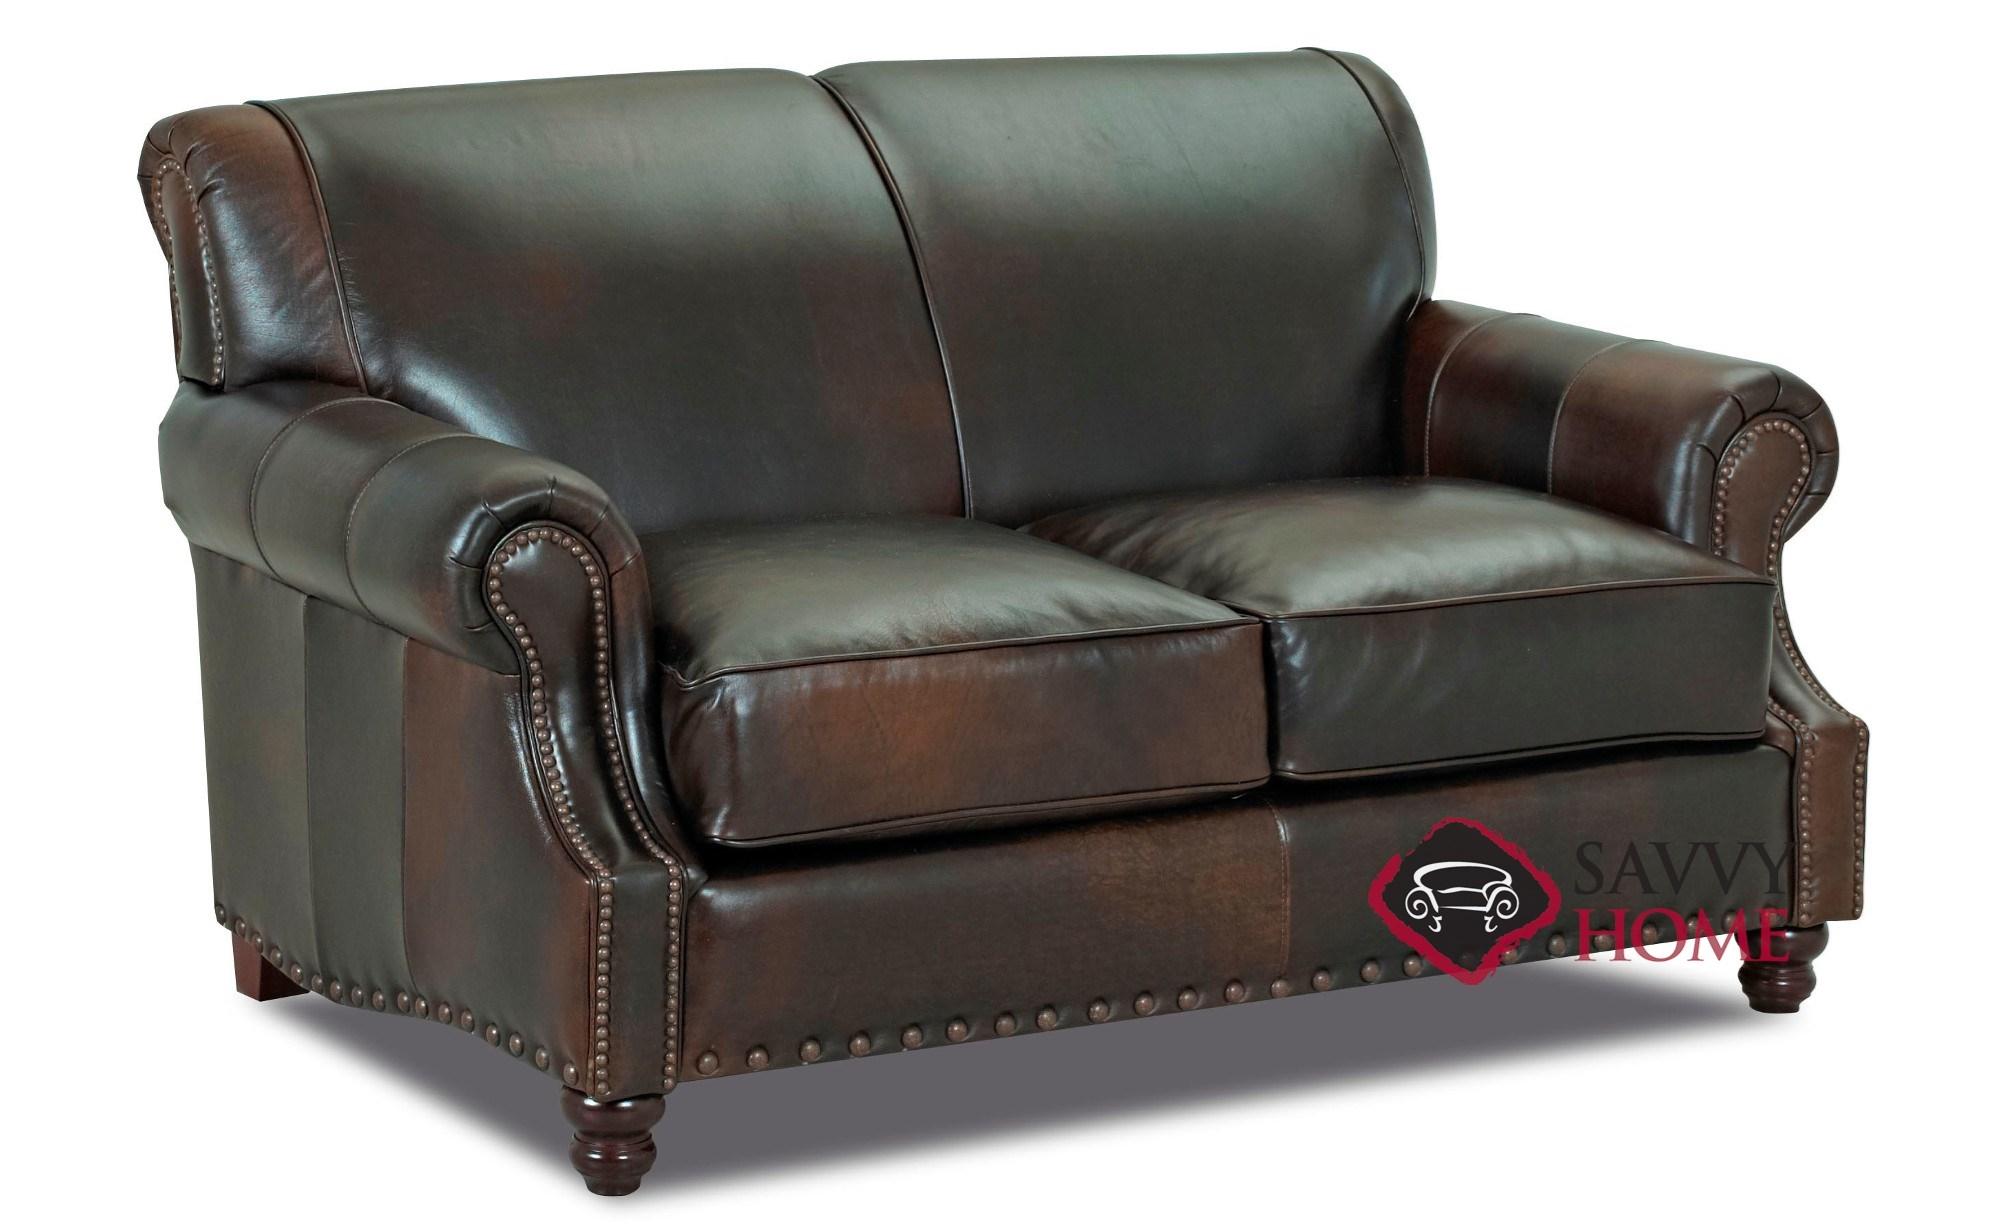 Strange Fairbanks Leather Loveseat By Savvy Inzonedesignstudio Interior Chair Design Inzonedesignstudiocom